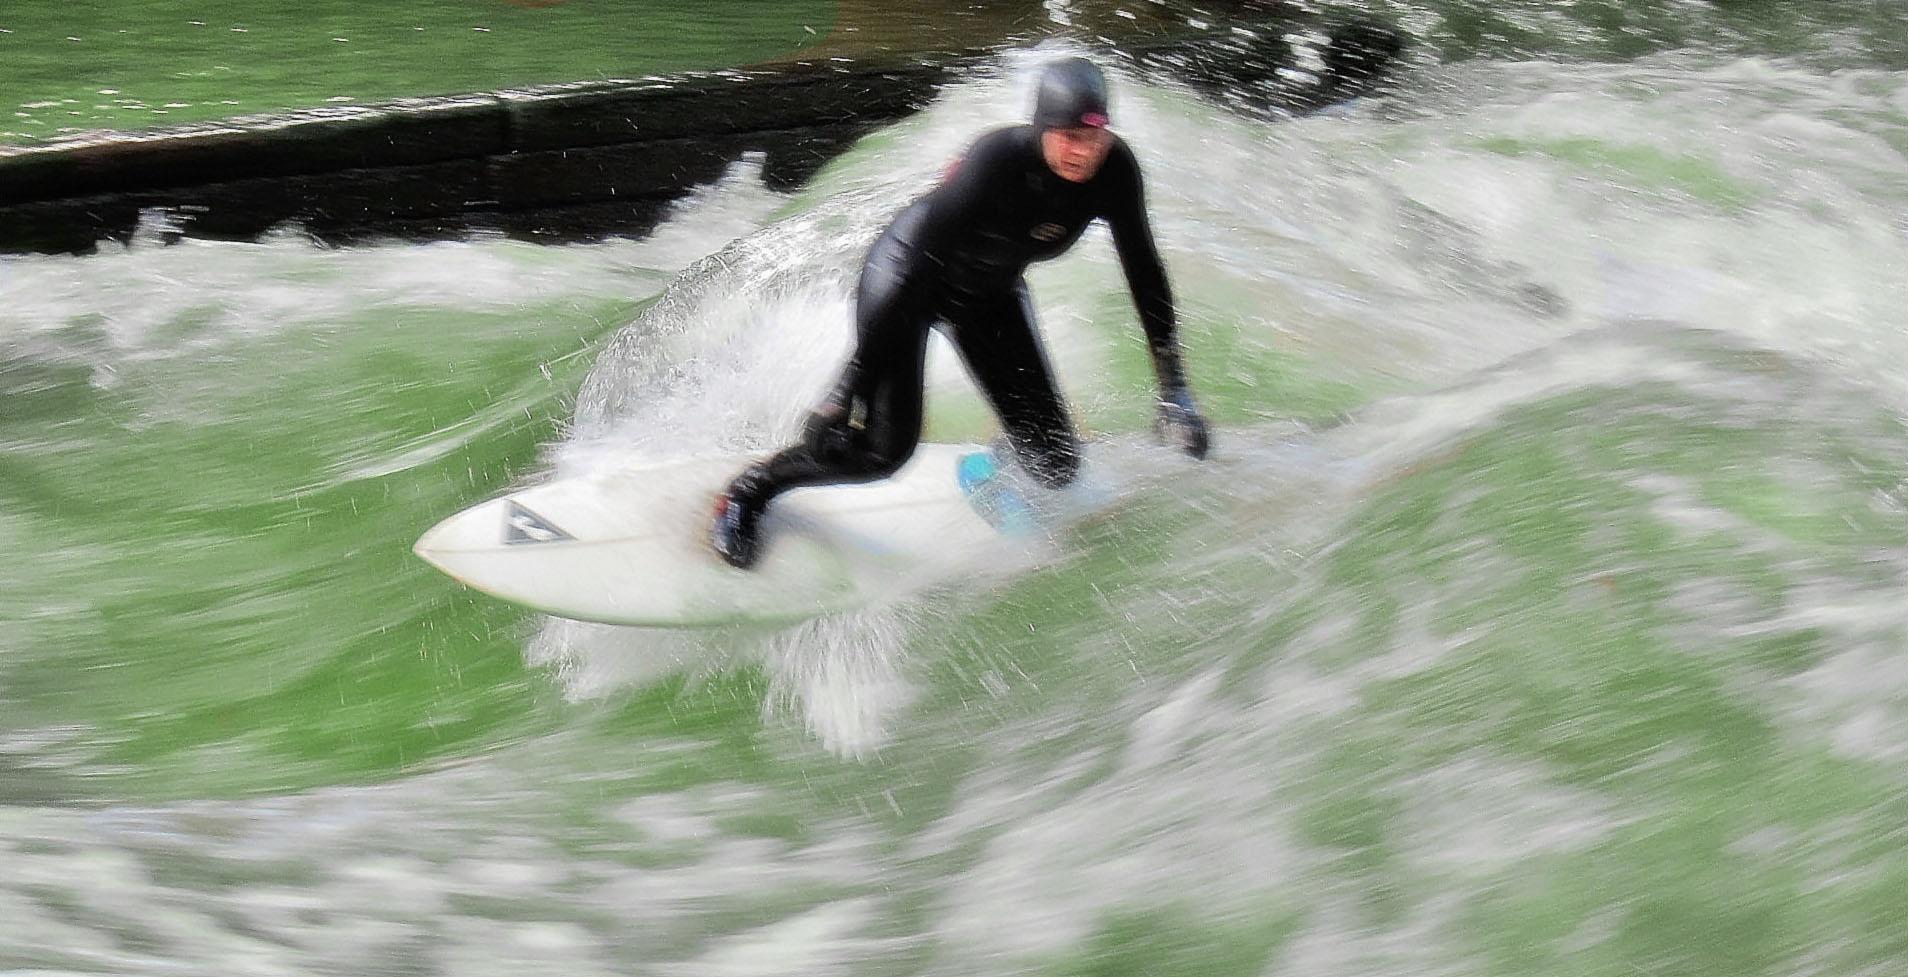 Surfer an Waldmeister